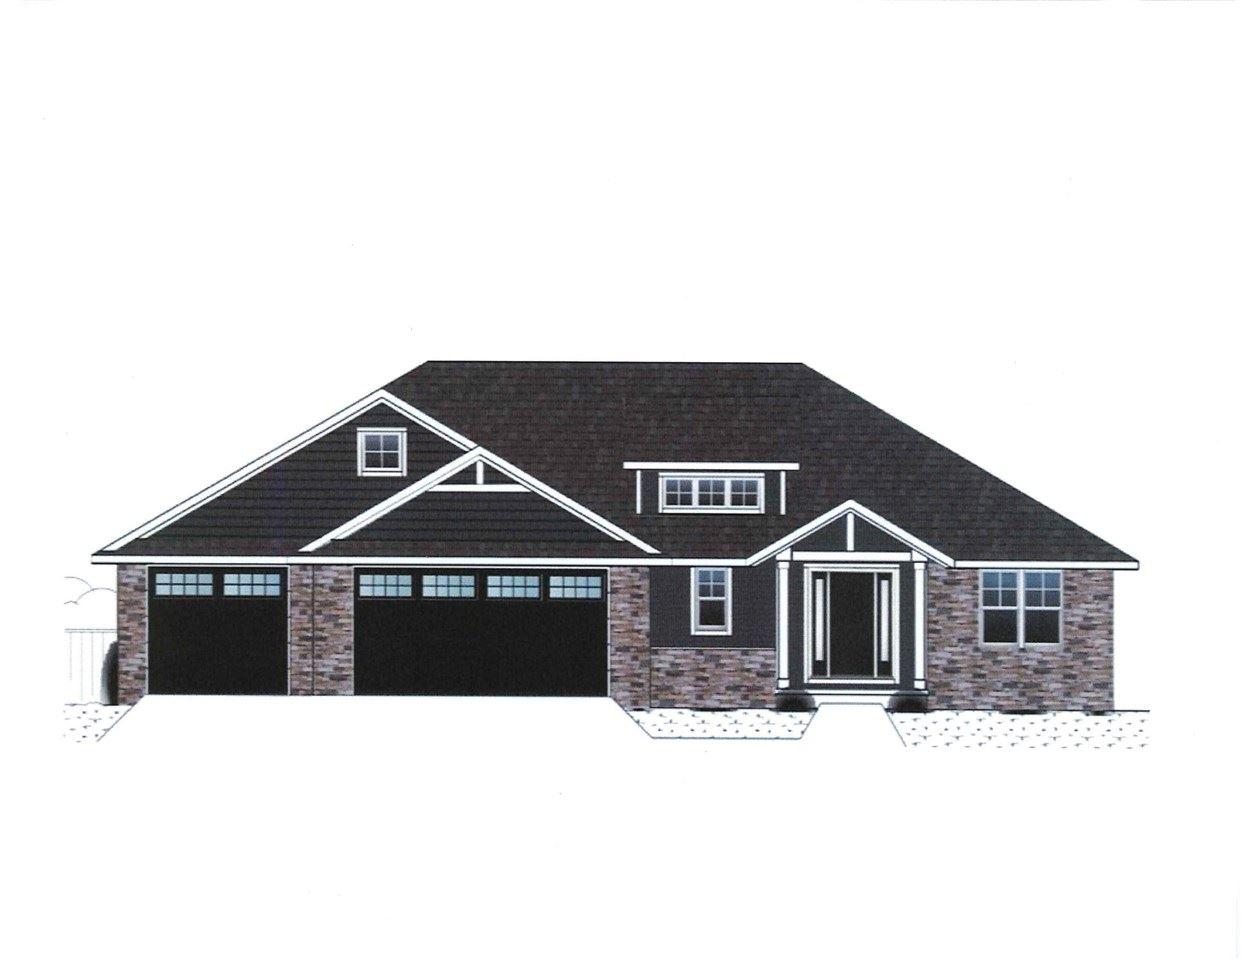 2685 WILLOW GROVE Lane, Green Bay, WI 54311 - MLS#: 50244512